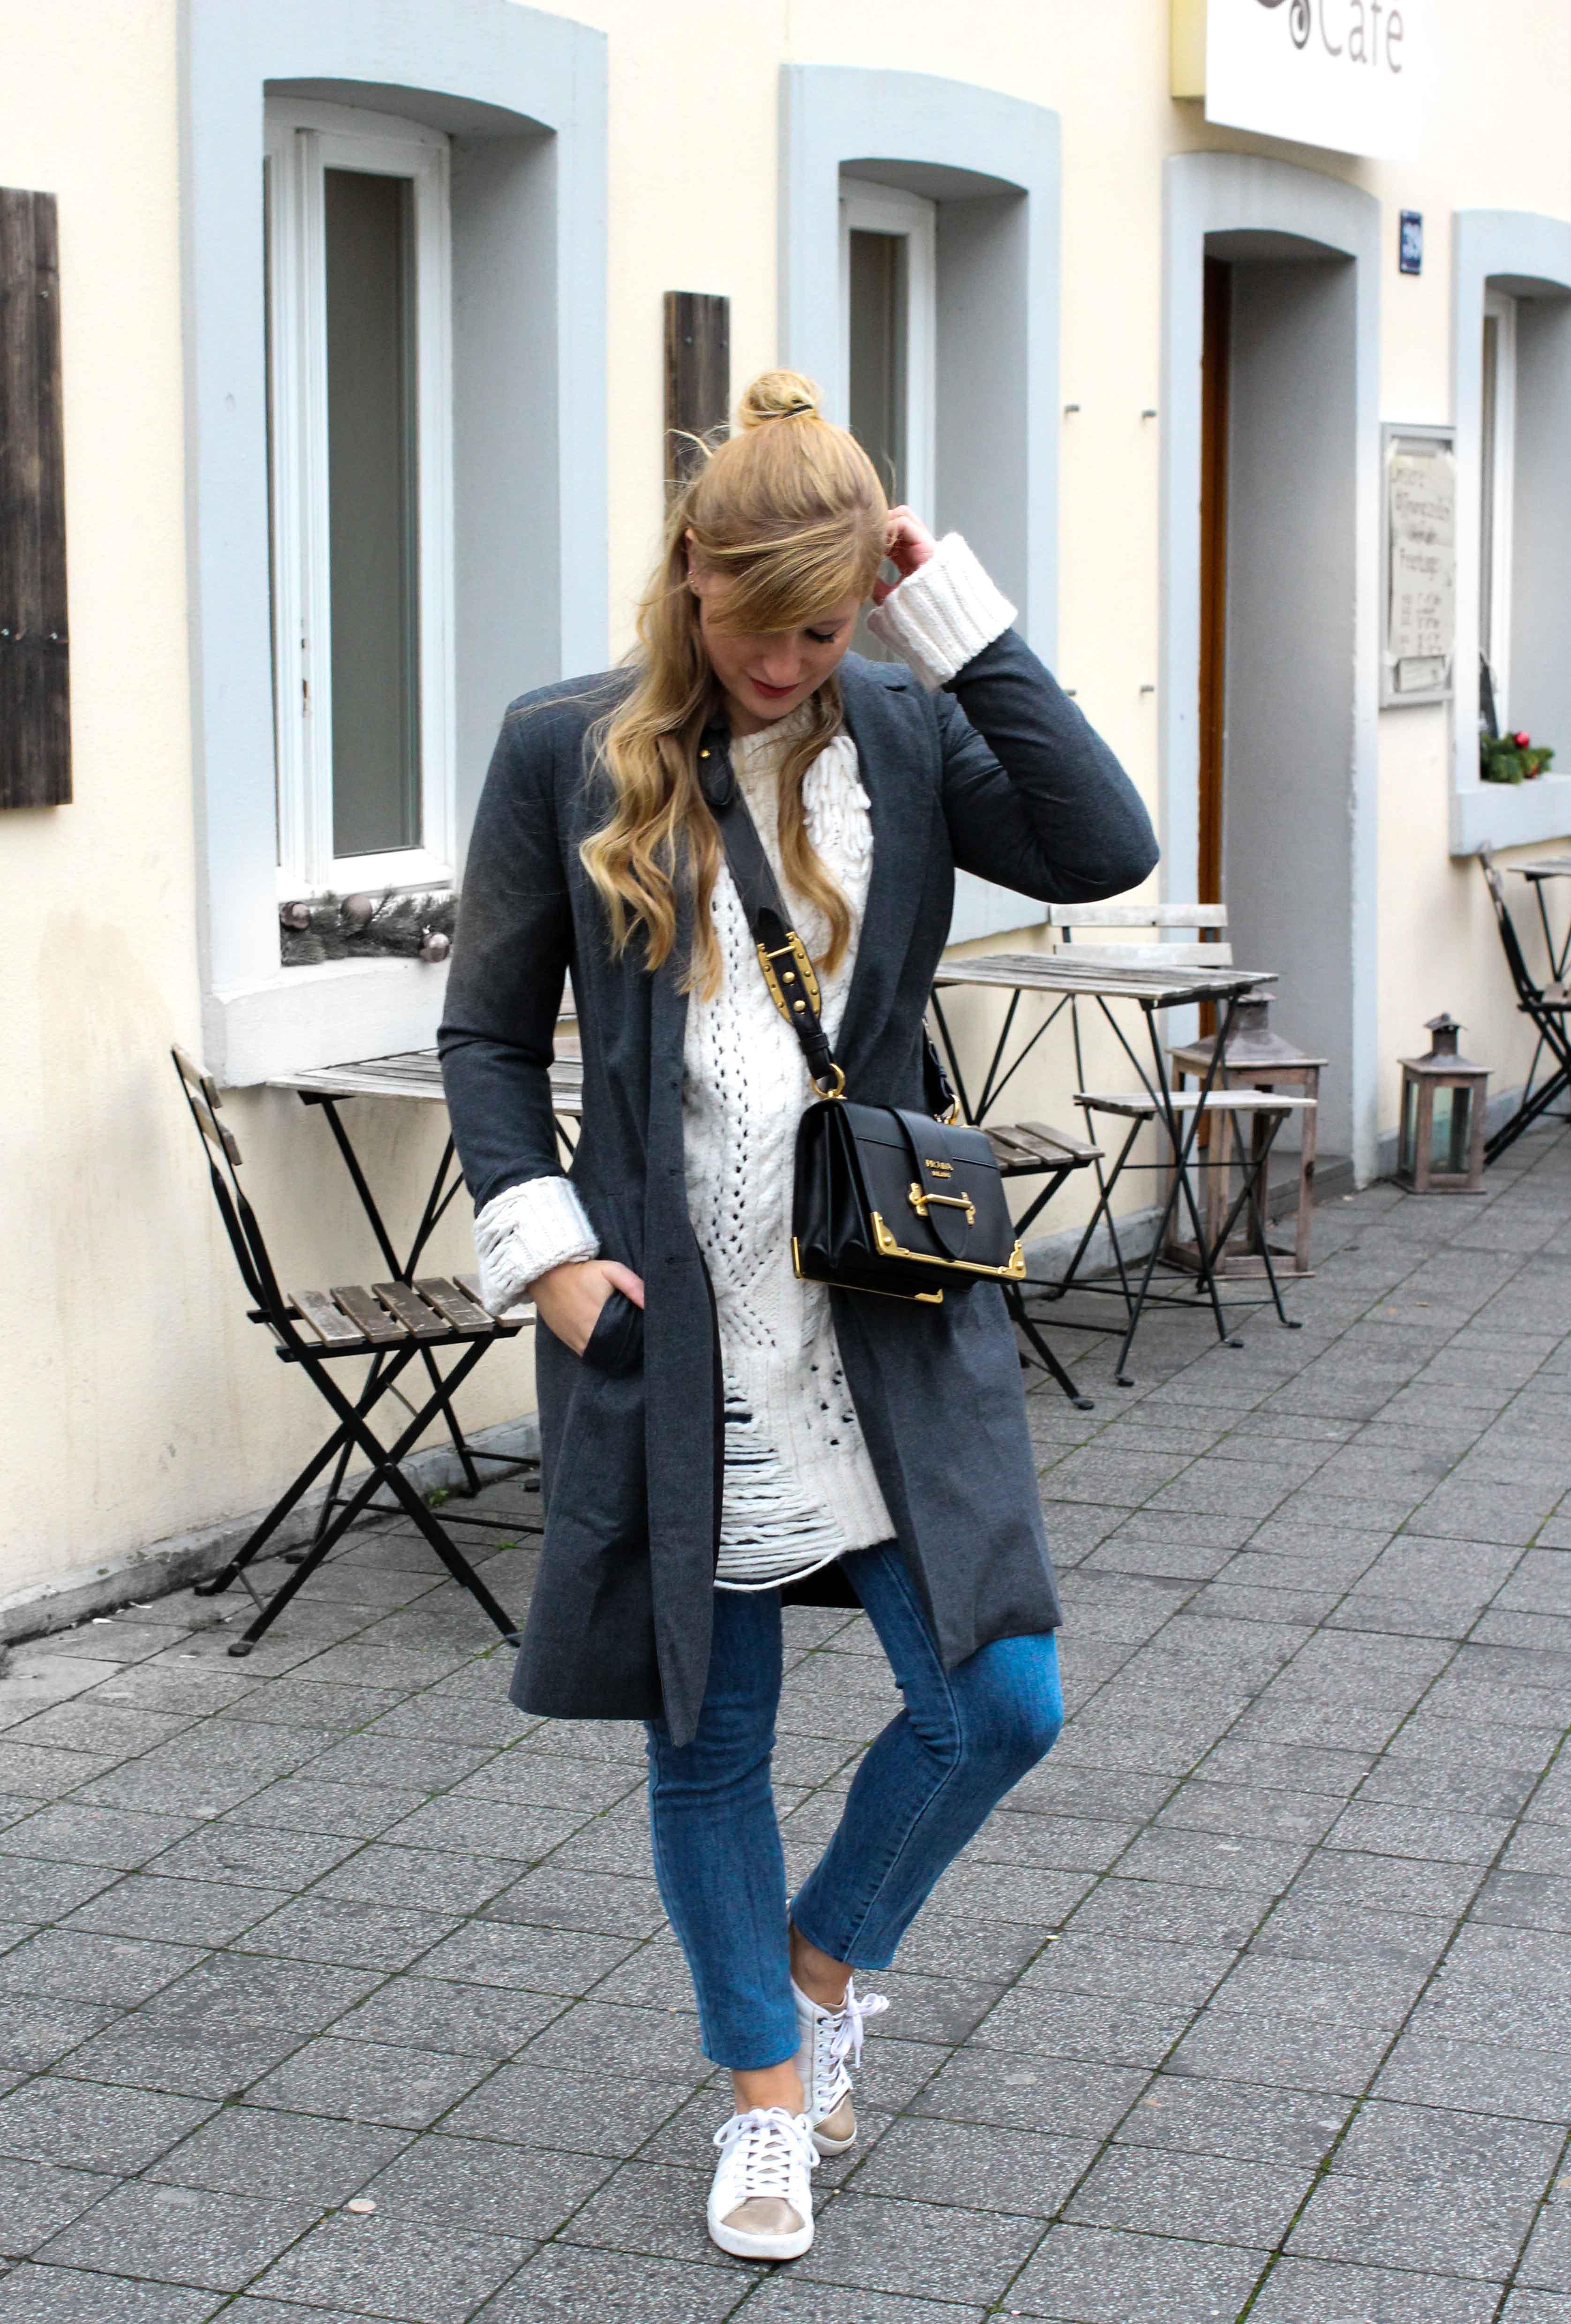 online store 5e2bb 85456 Zara Wollpullover, weiße Sneaker & Blue Jeans   Winterlook ...